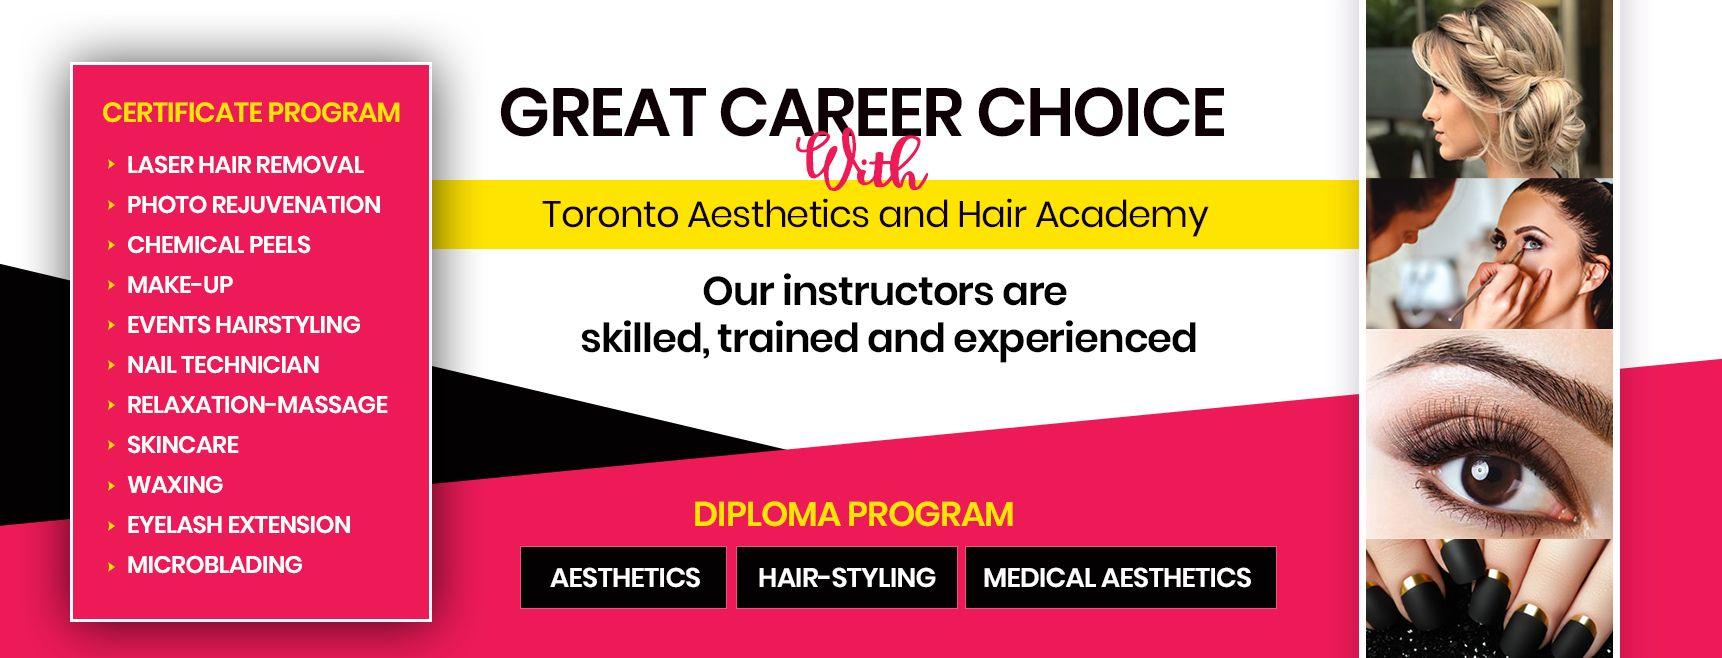 Great Career Choice with Toronto Aesthetics and Hair